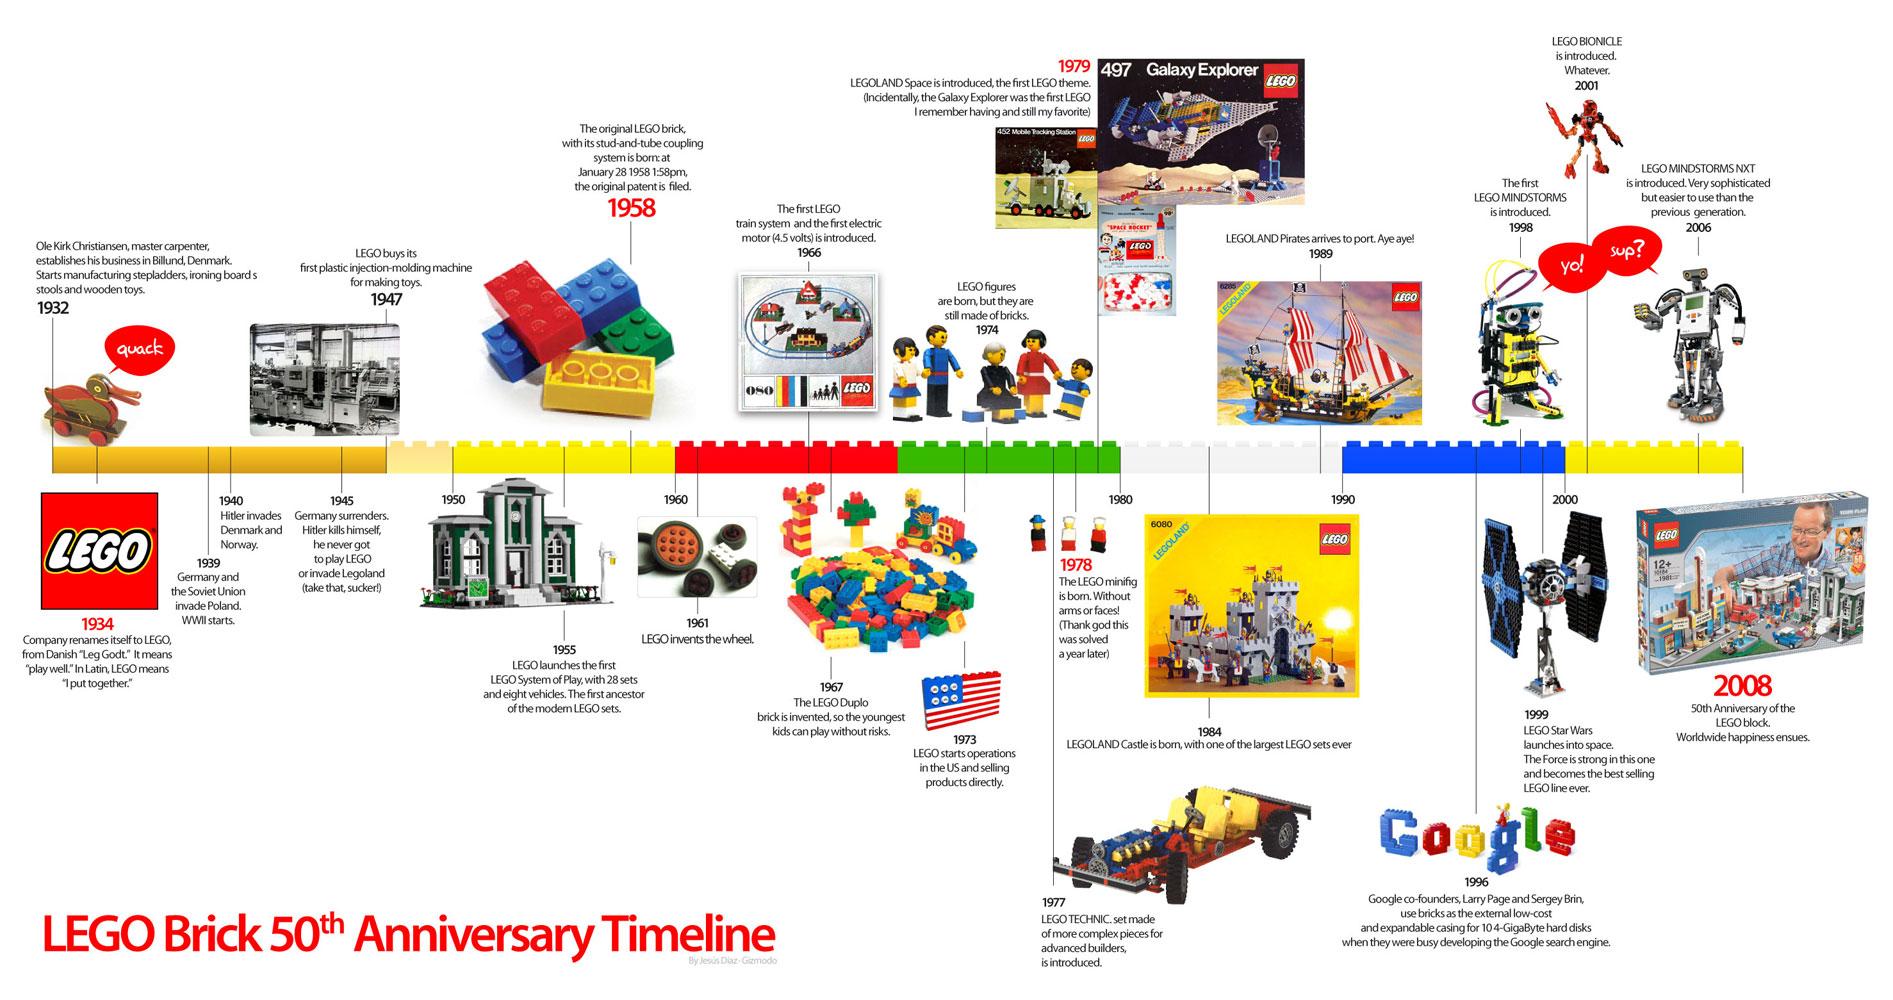 https://i0.wp.com/www.props.eric-hart.com/wp-content/uploads/2010/04/lego-brick4-timeline.jpg